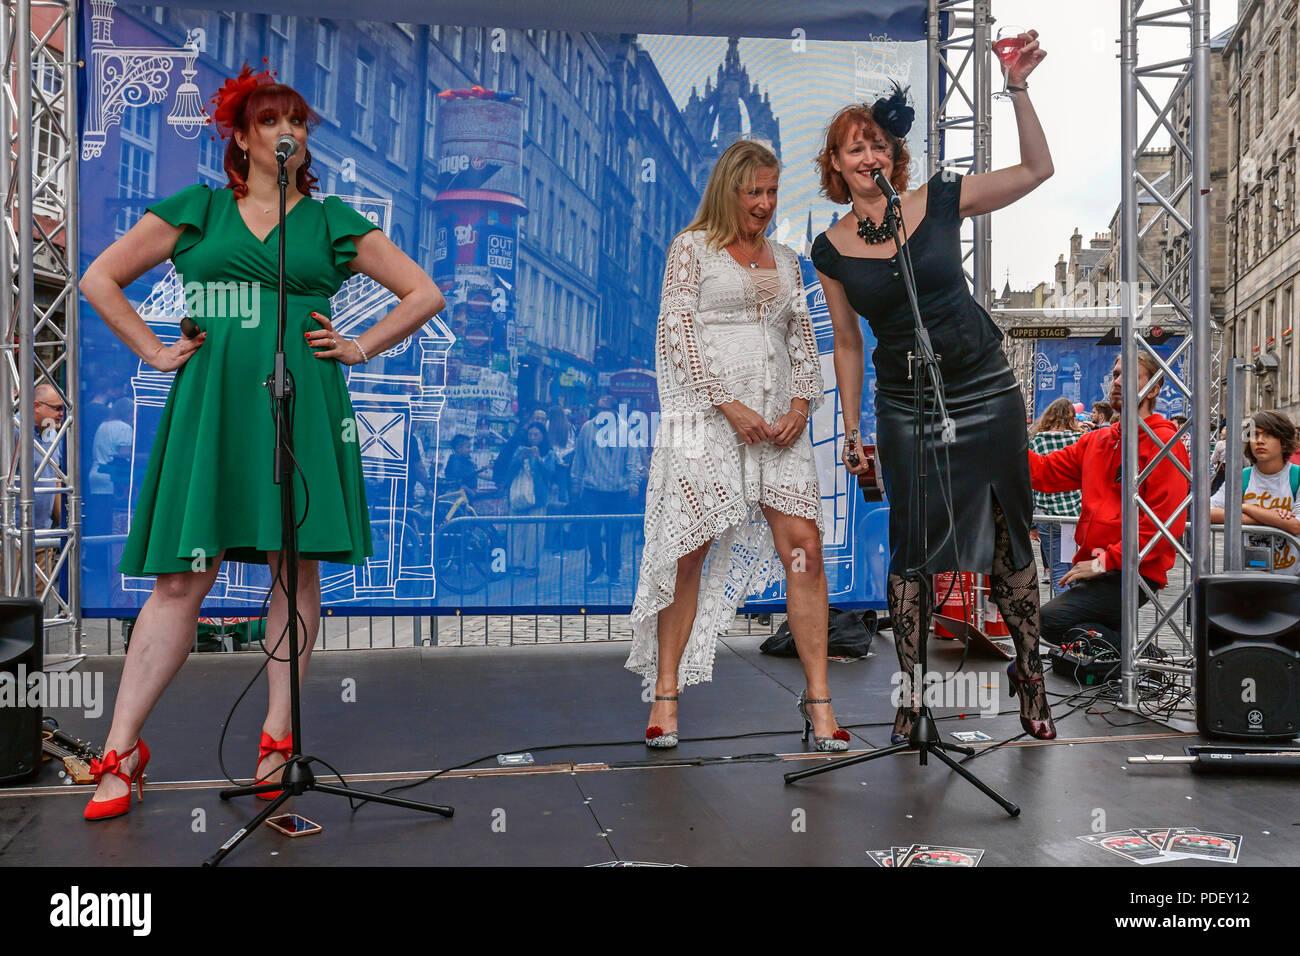 Till Death do us Part group of three ladies performs atThe Edinburgh Festival Fringe 2018 in High Street The Royal Mile Edinburgh Scotland UK - Stock Image